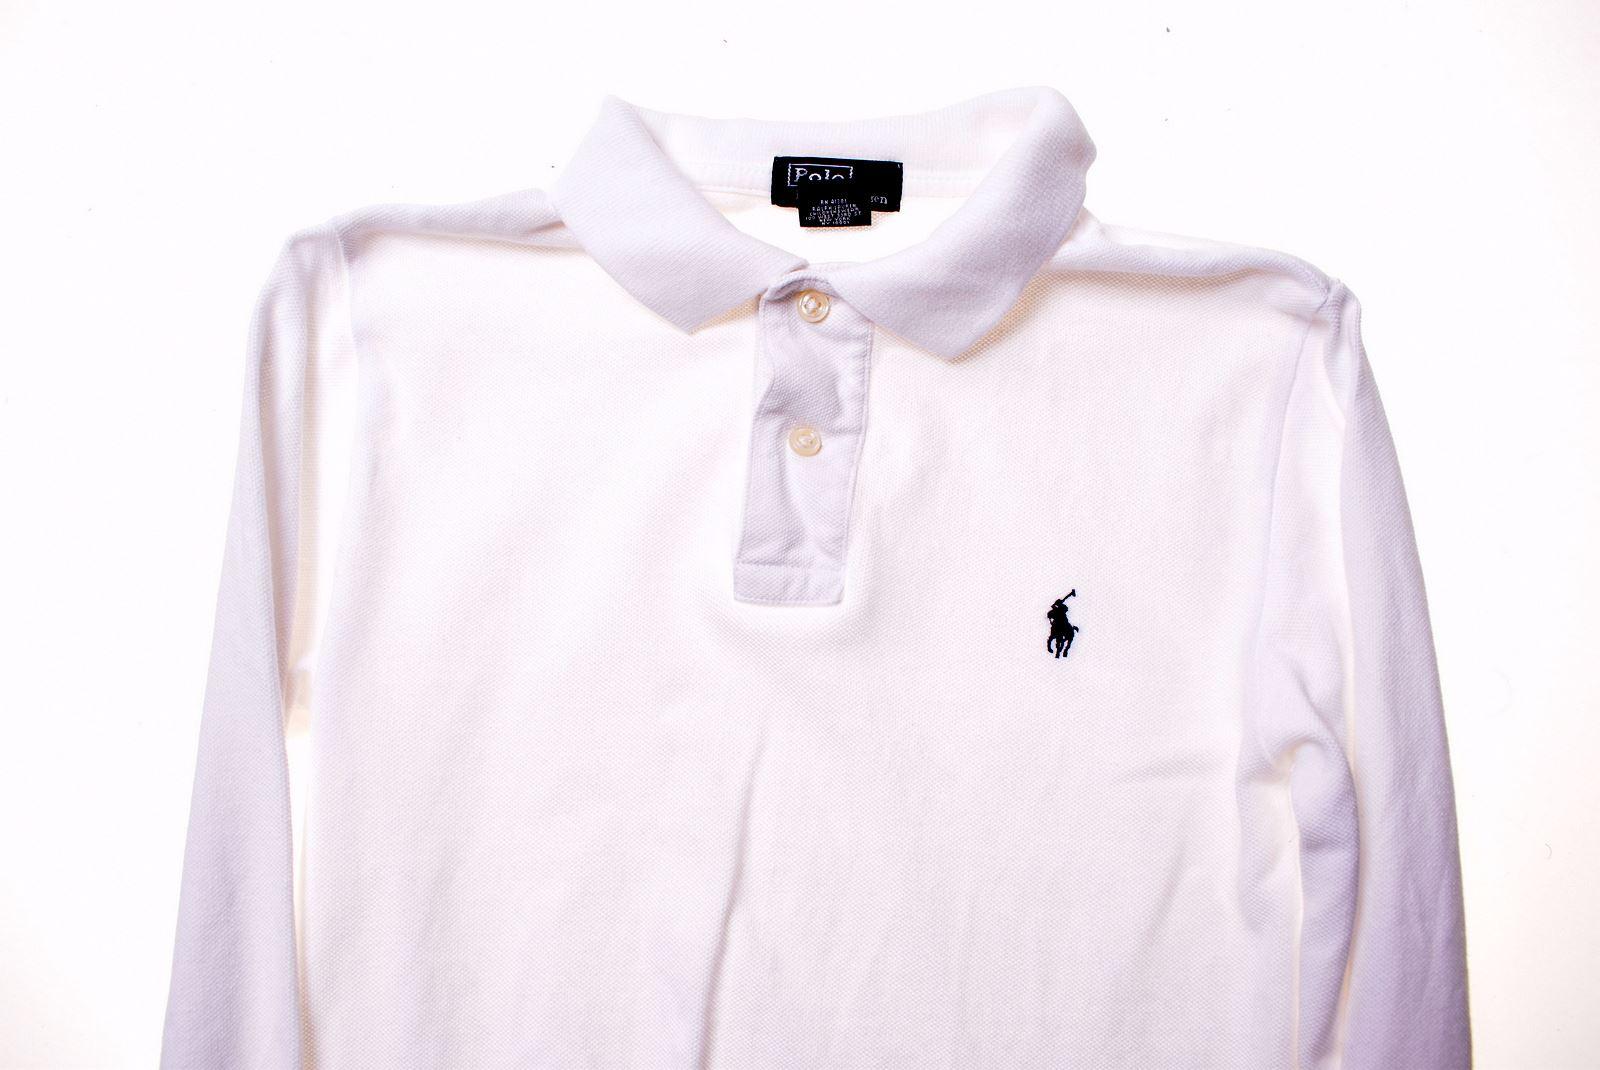 Ralph Lauren Boys Teenage Unisex Long Sleeve T Shirts Tops Soft Cotton 2-20 Year